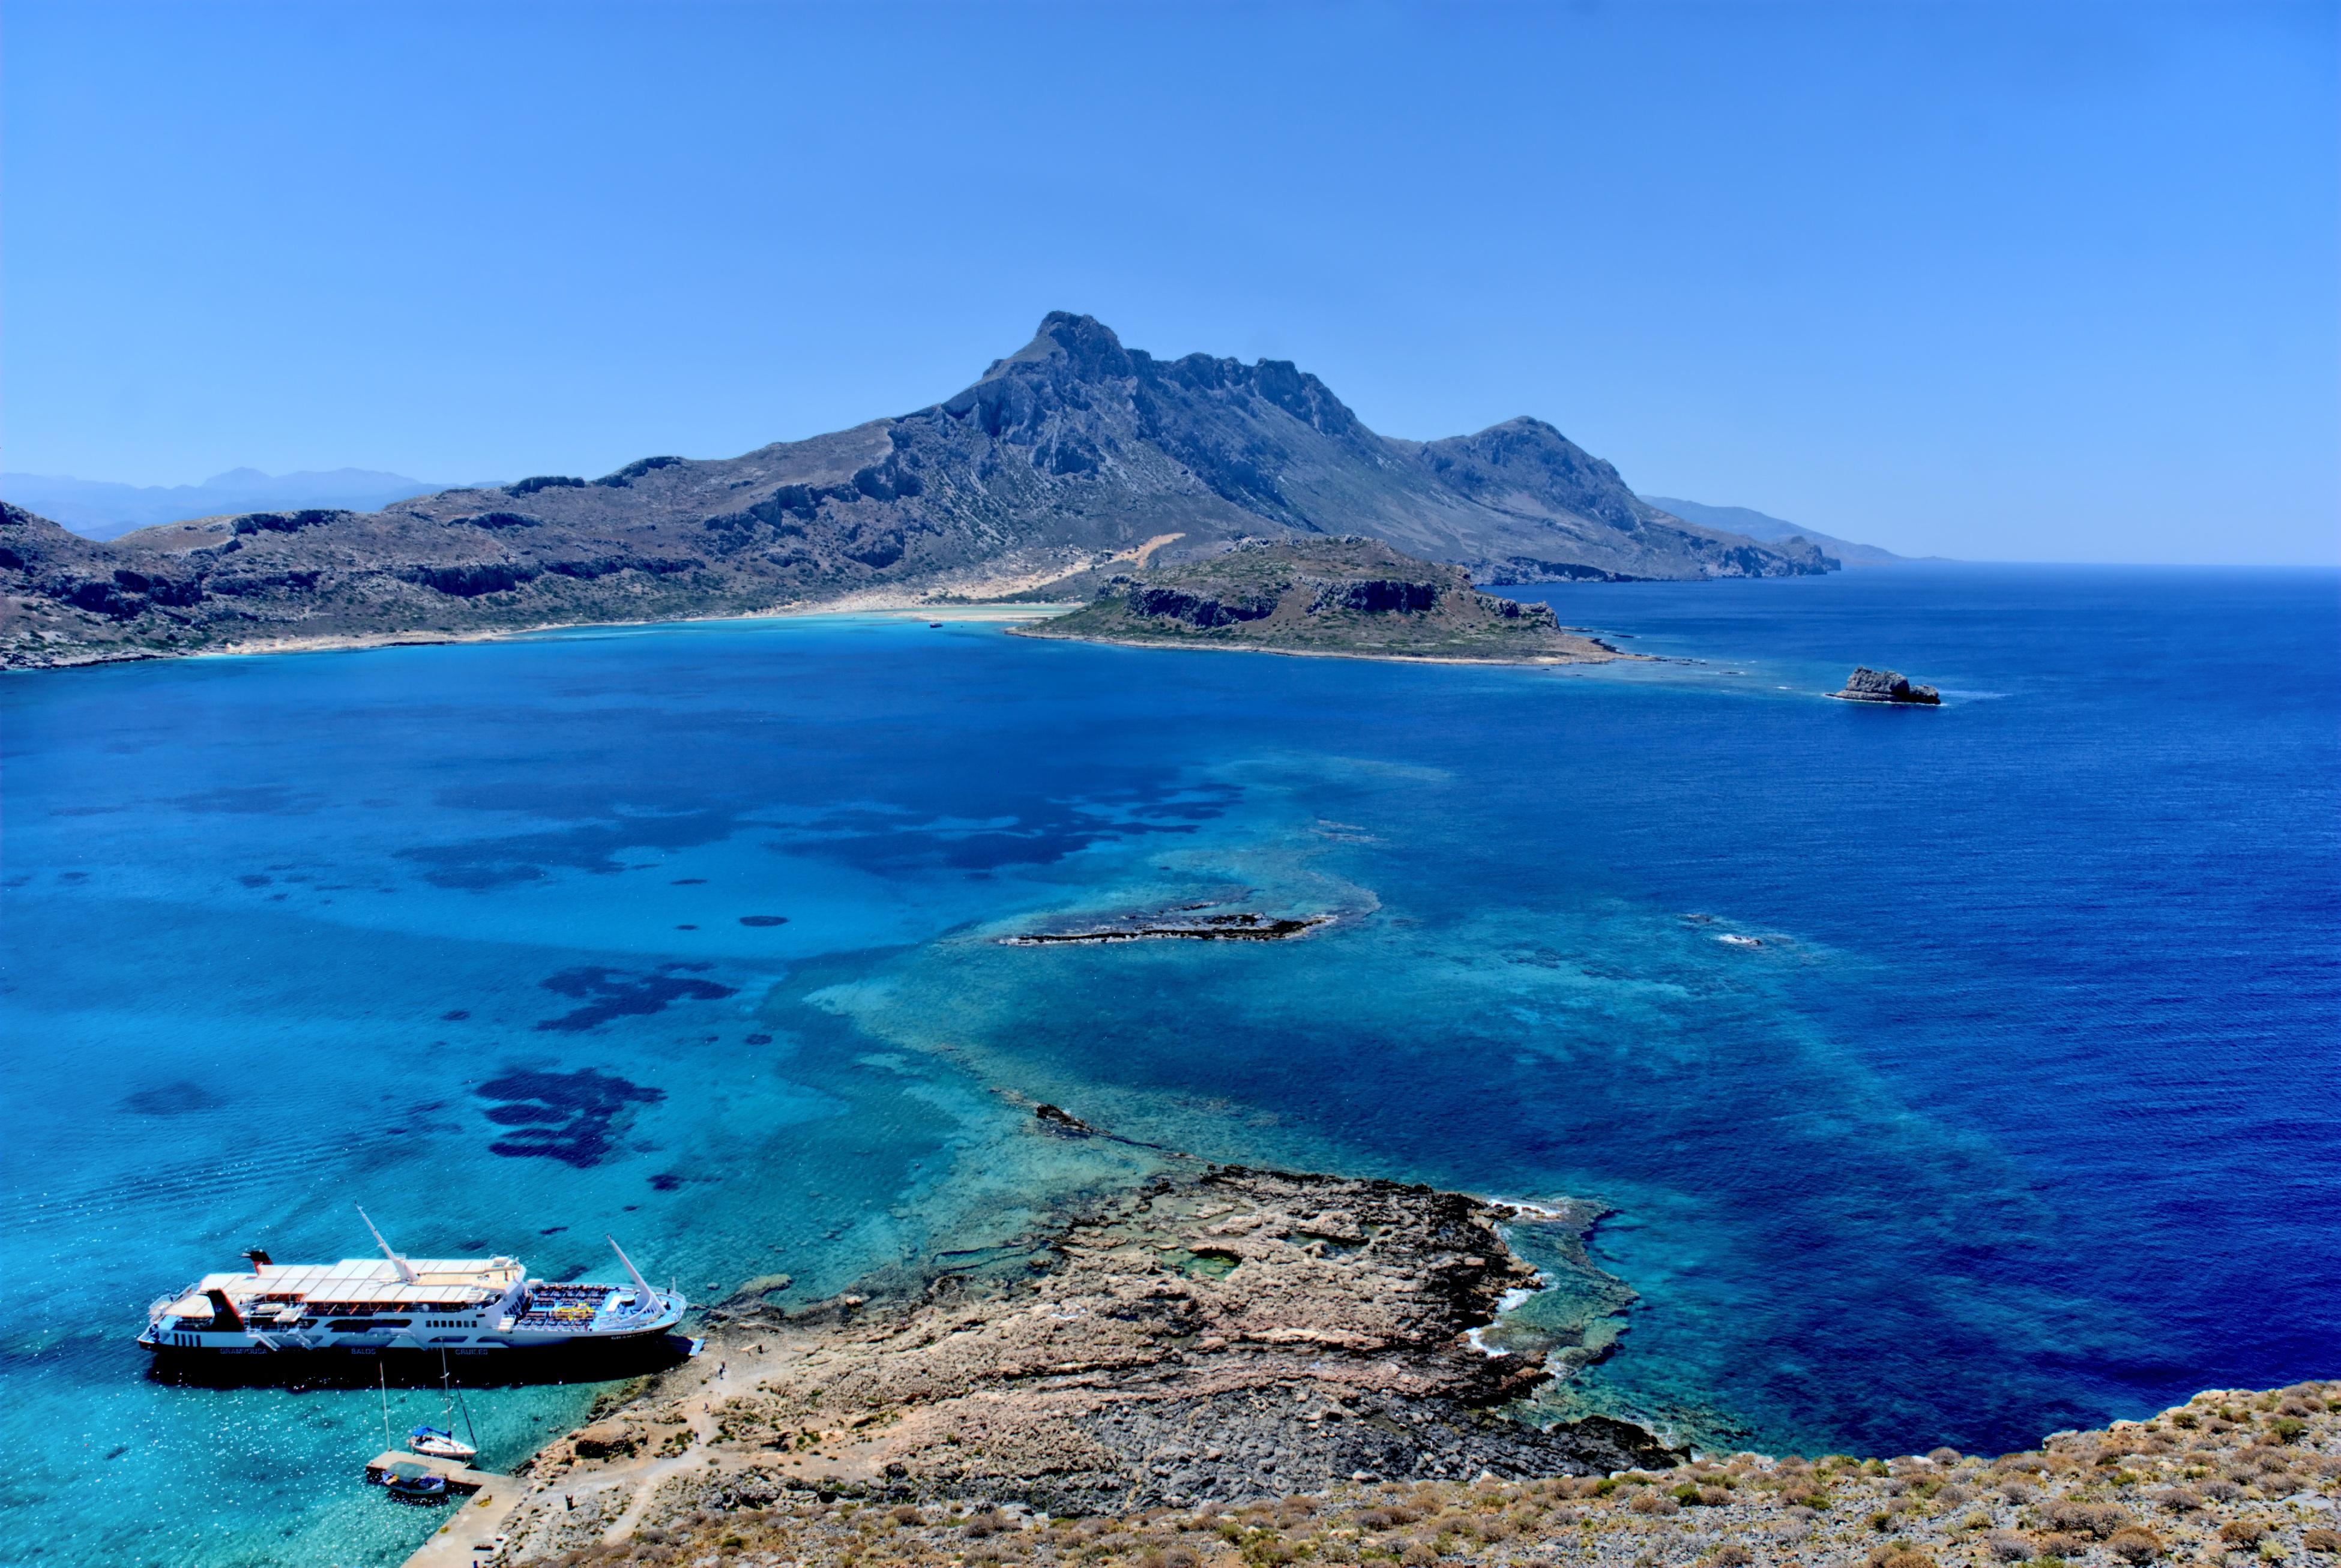 ходе отдых в греции остров крит фото данной кухни динамичен